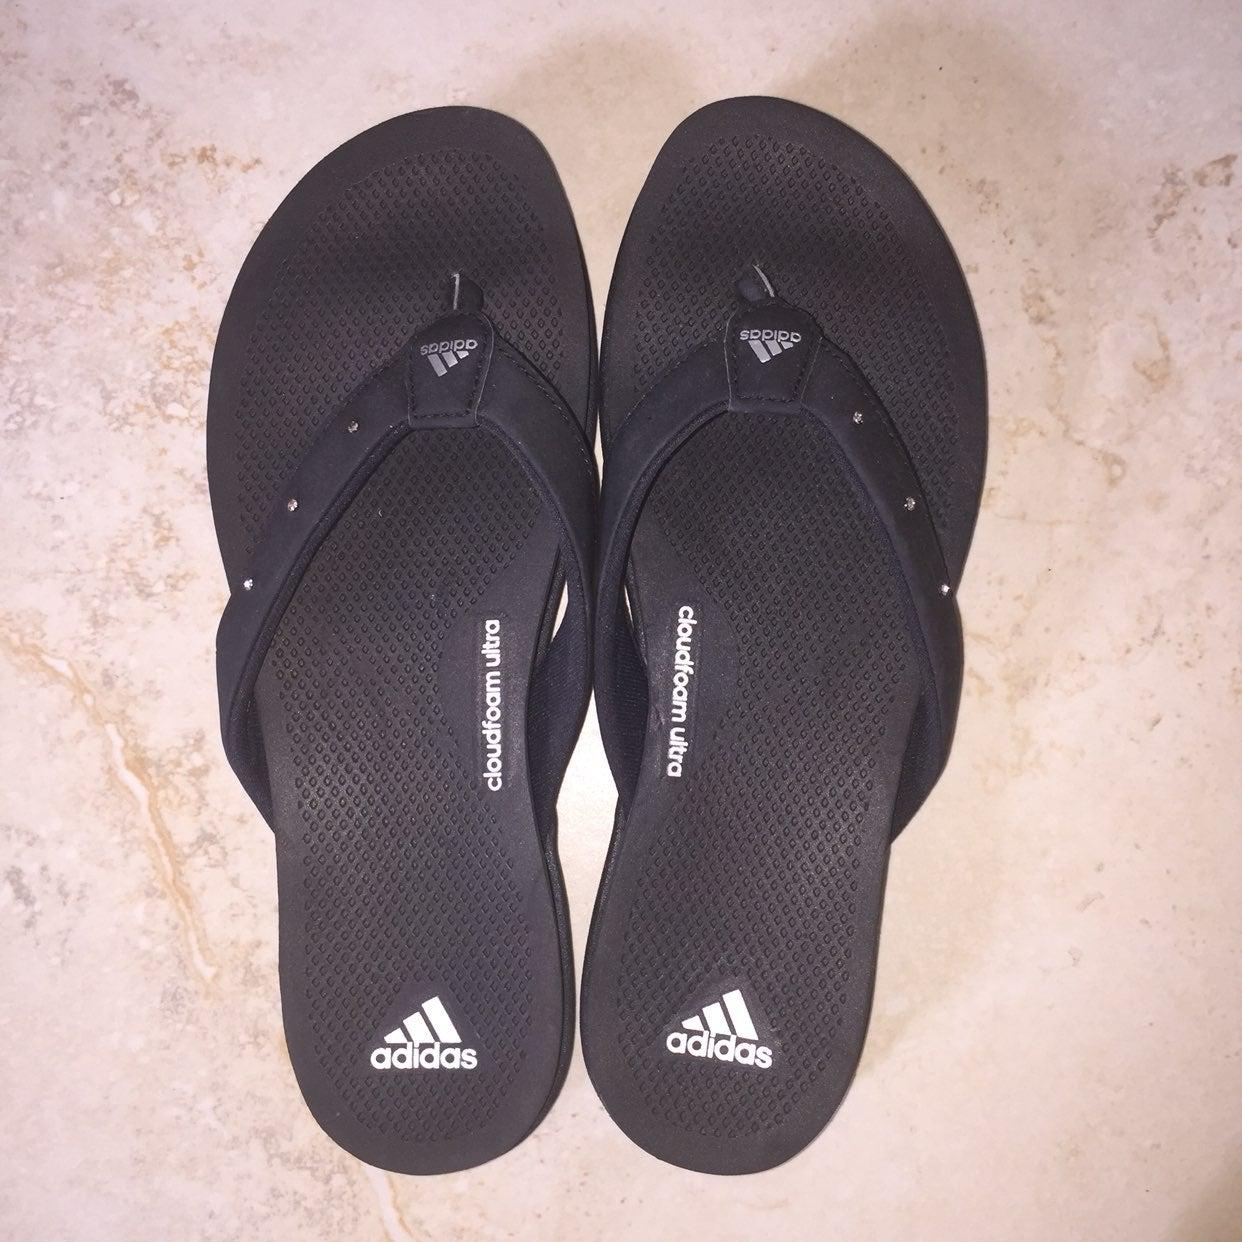 Adidas Supercloud Plus Thong Flip Flops